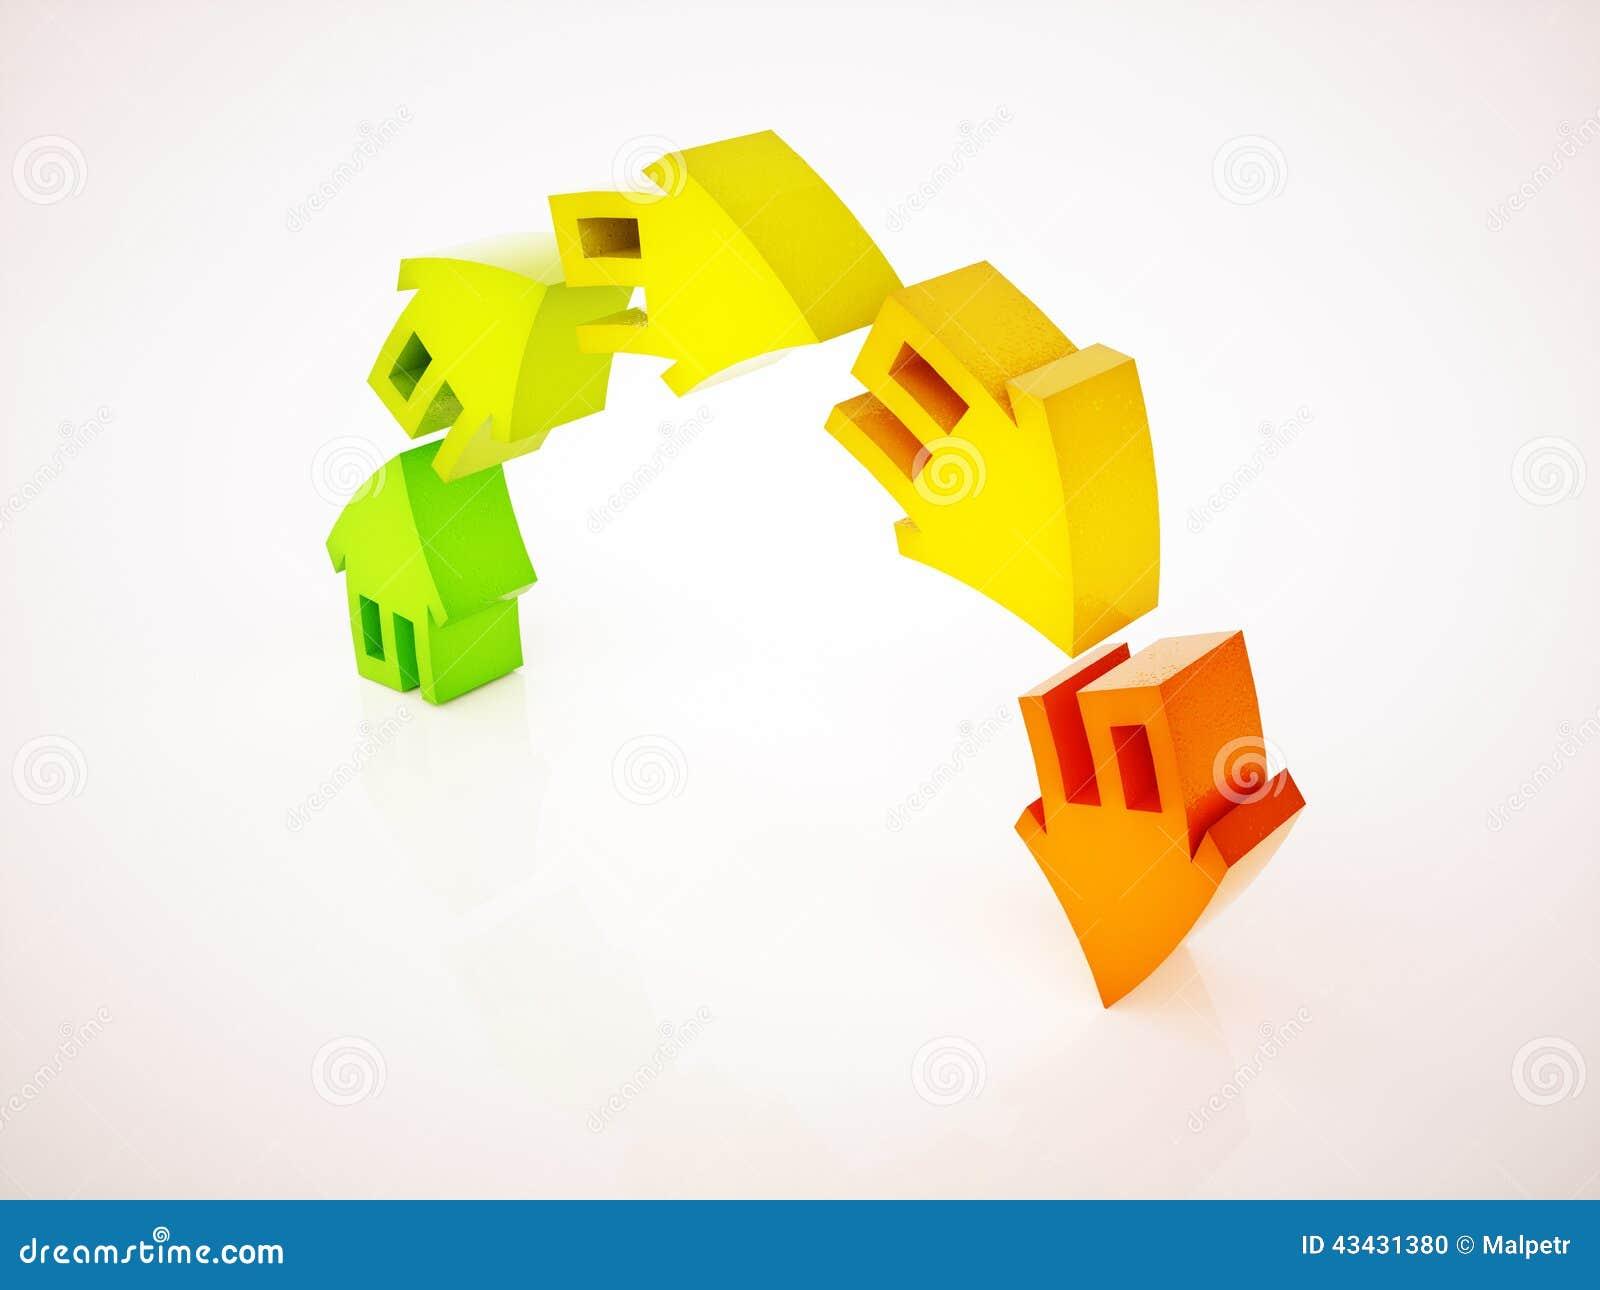 Overheating of real estate market